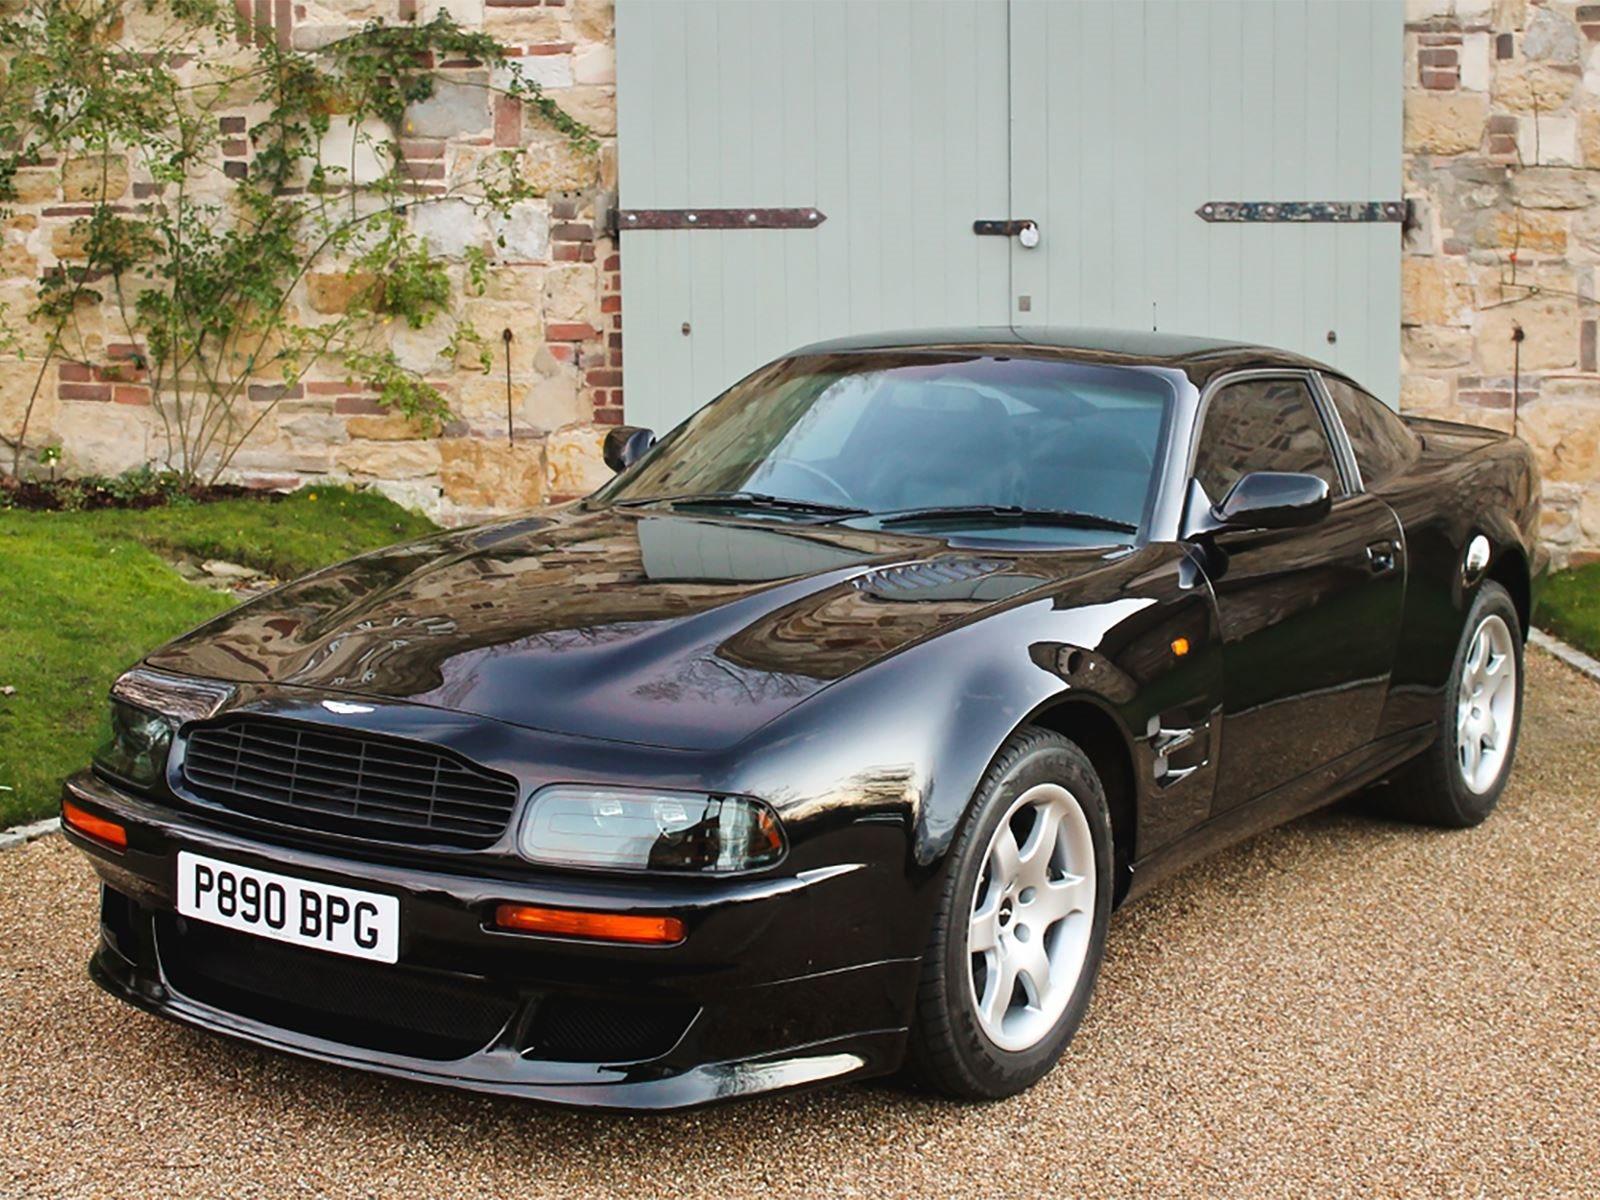 Elton John S Exquisite Aston Martin V8 Vantage Is For Sale Carbuzz